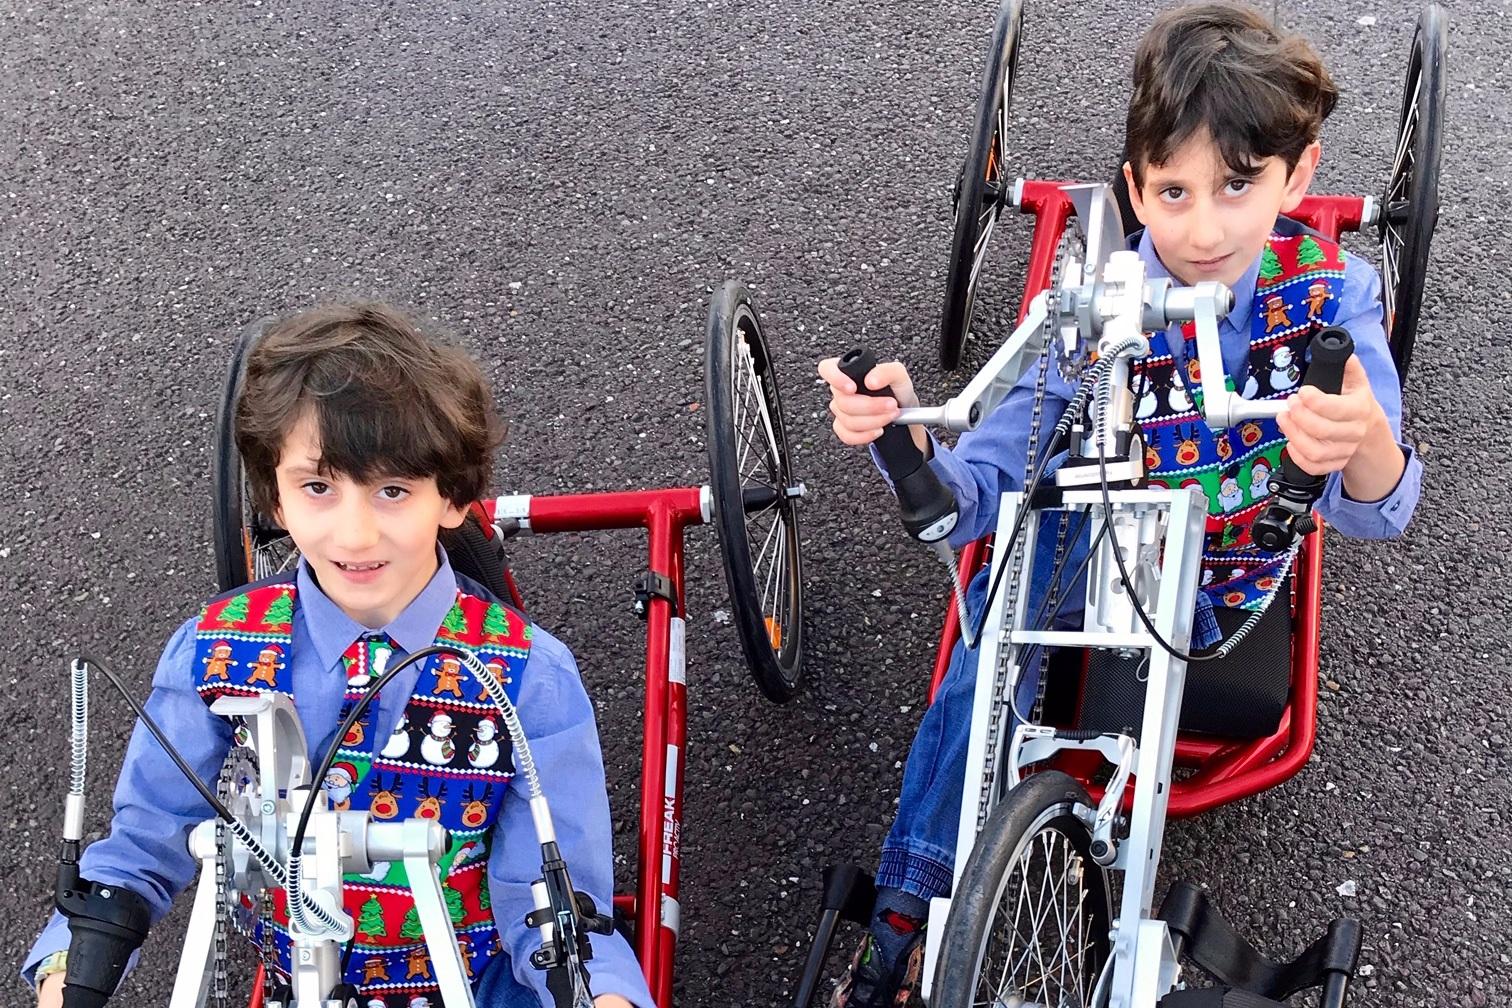 Hassan & Hussein Benhaffaf